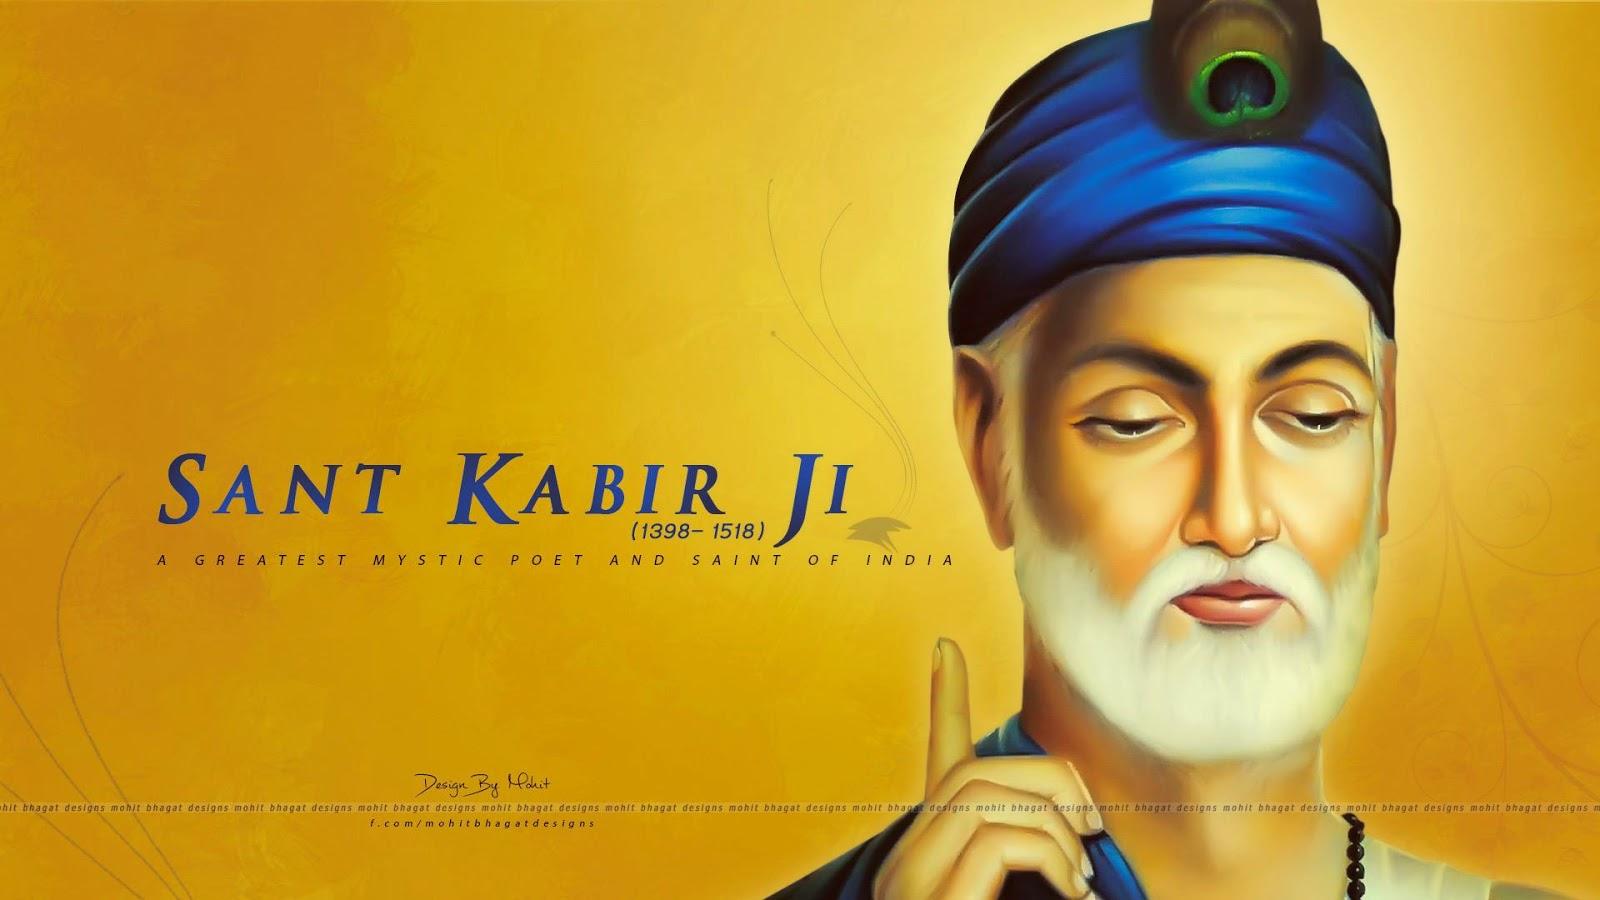 Sant Kabir Ji Design by Mohit Bhagat  Mohit Bhagat Designs